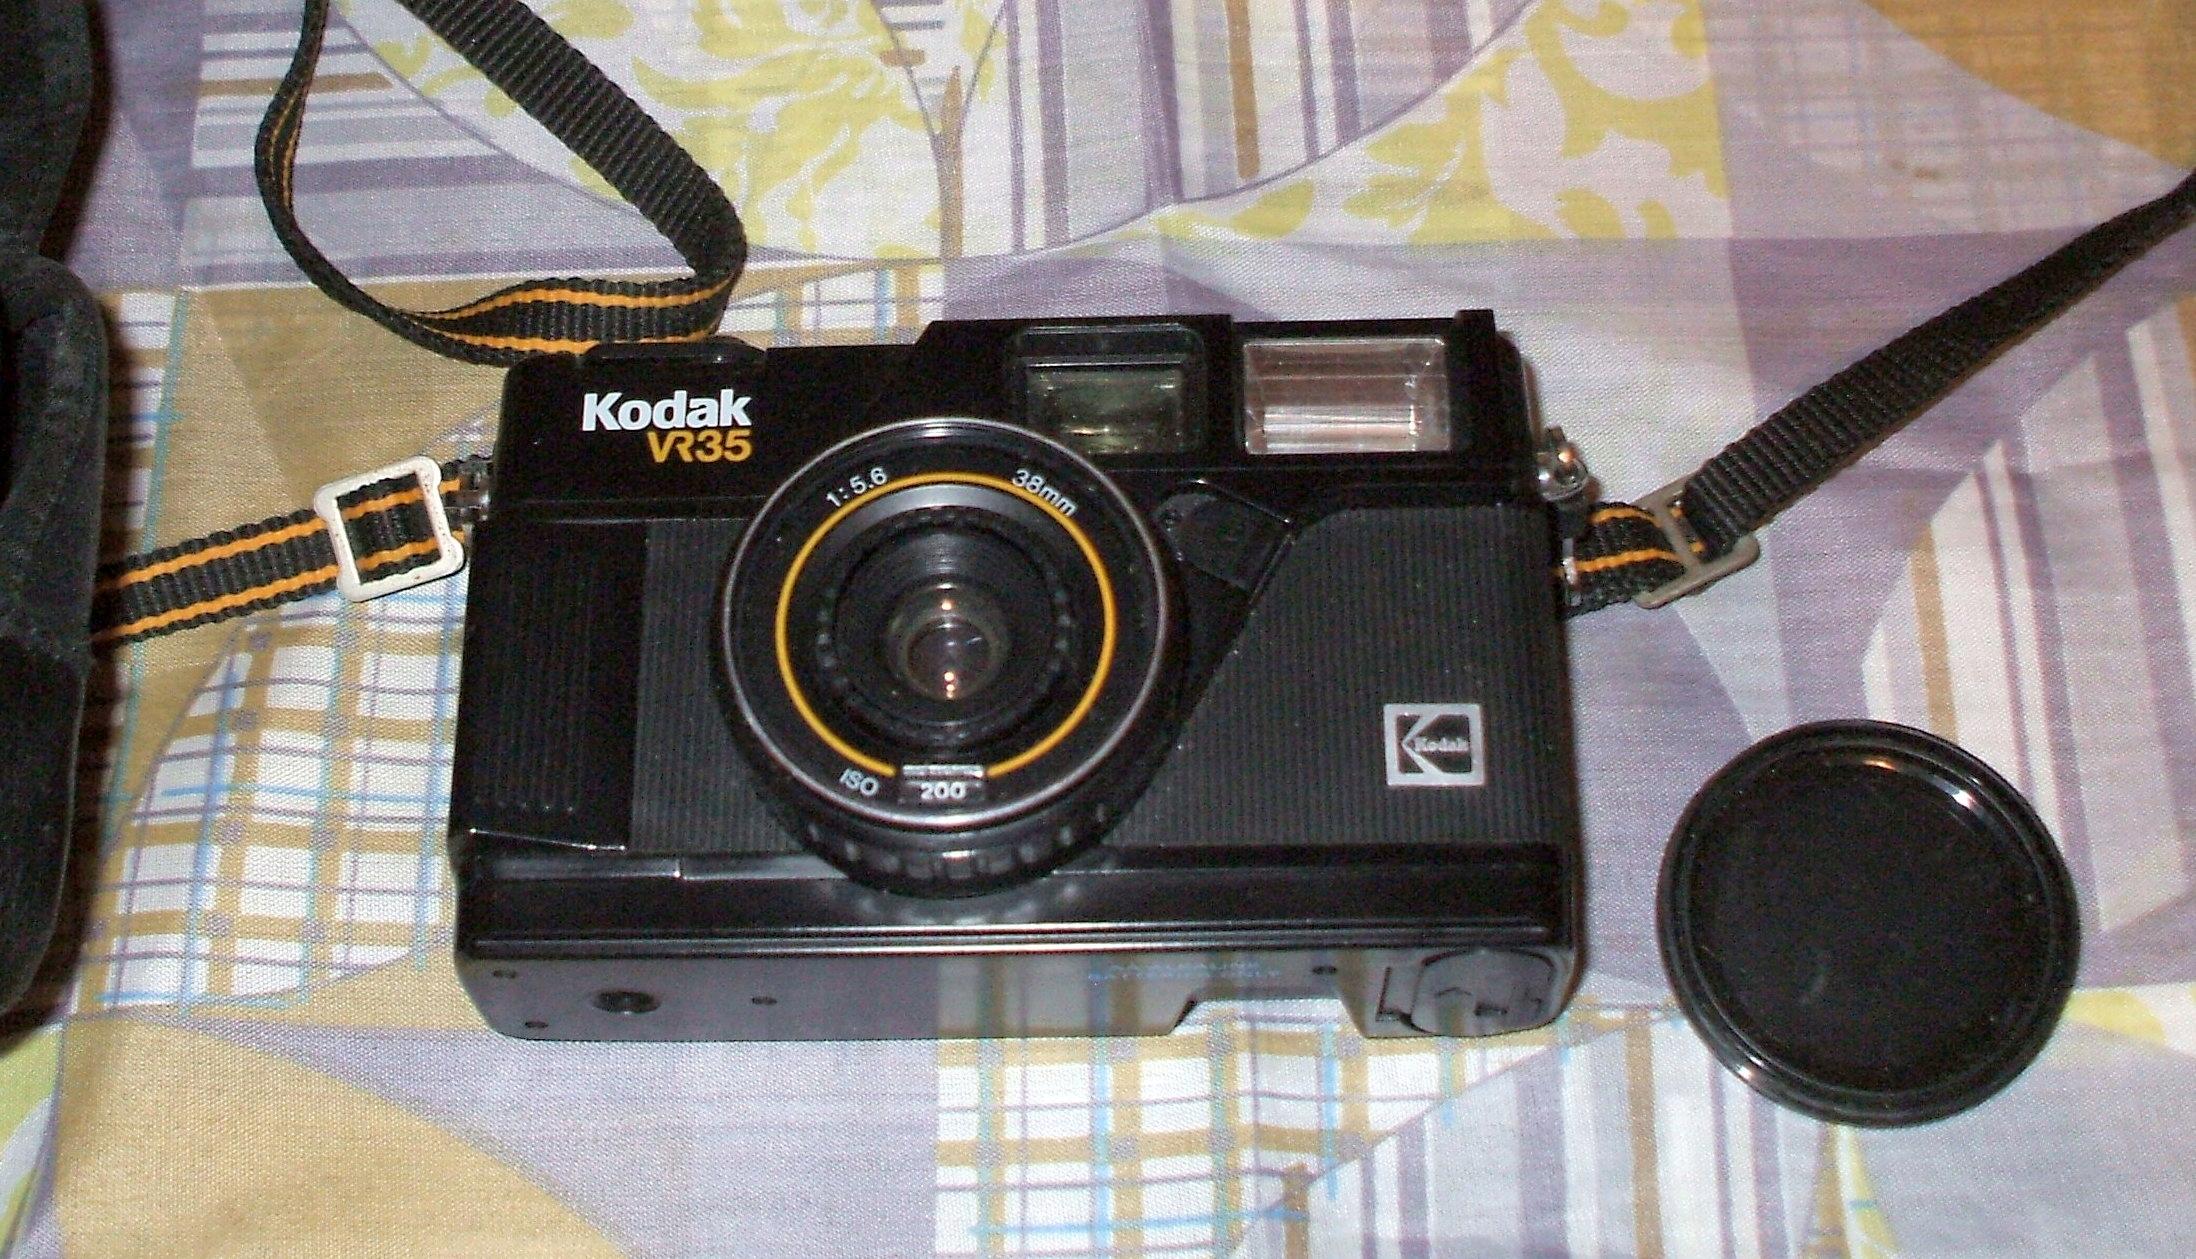 Aparat analogowy Kodak VR 35